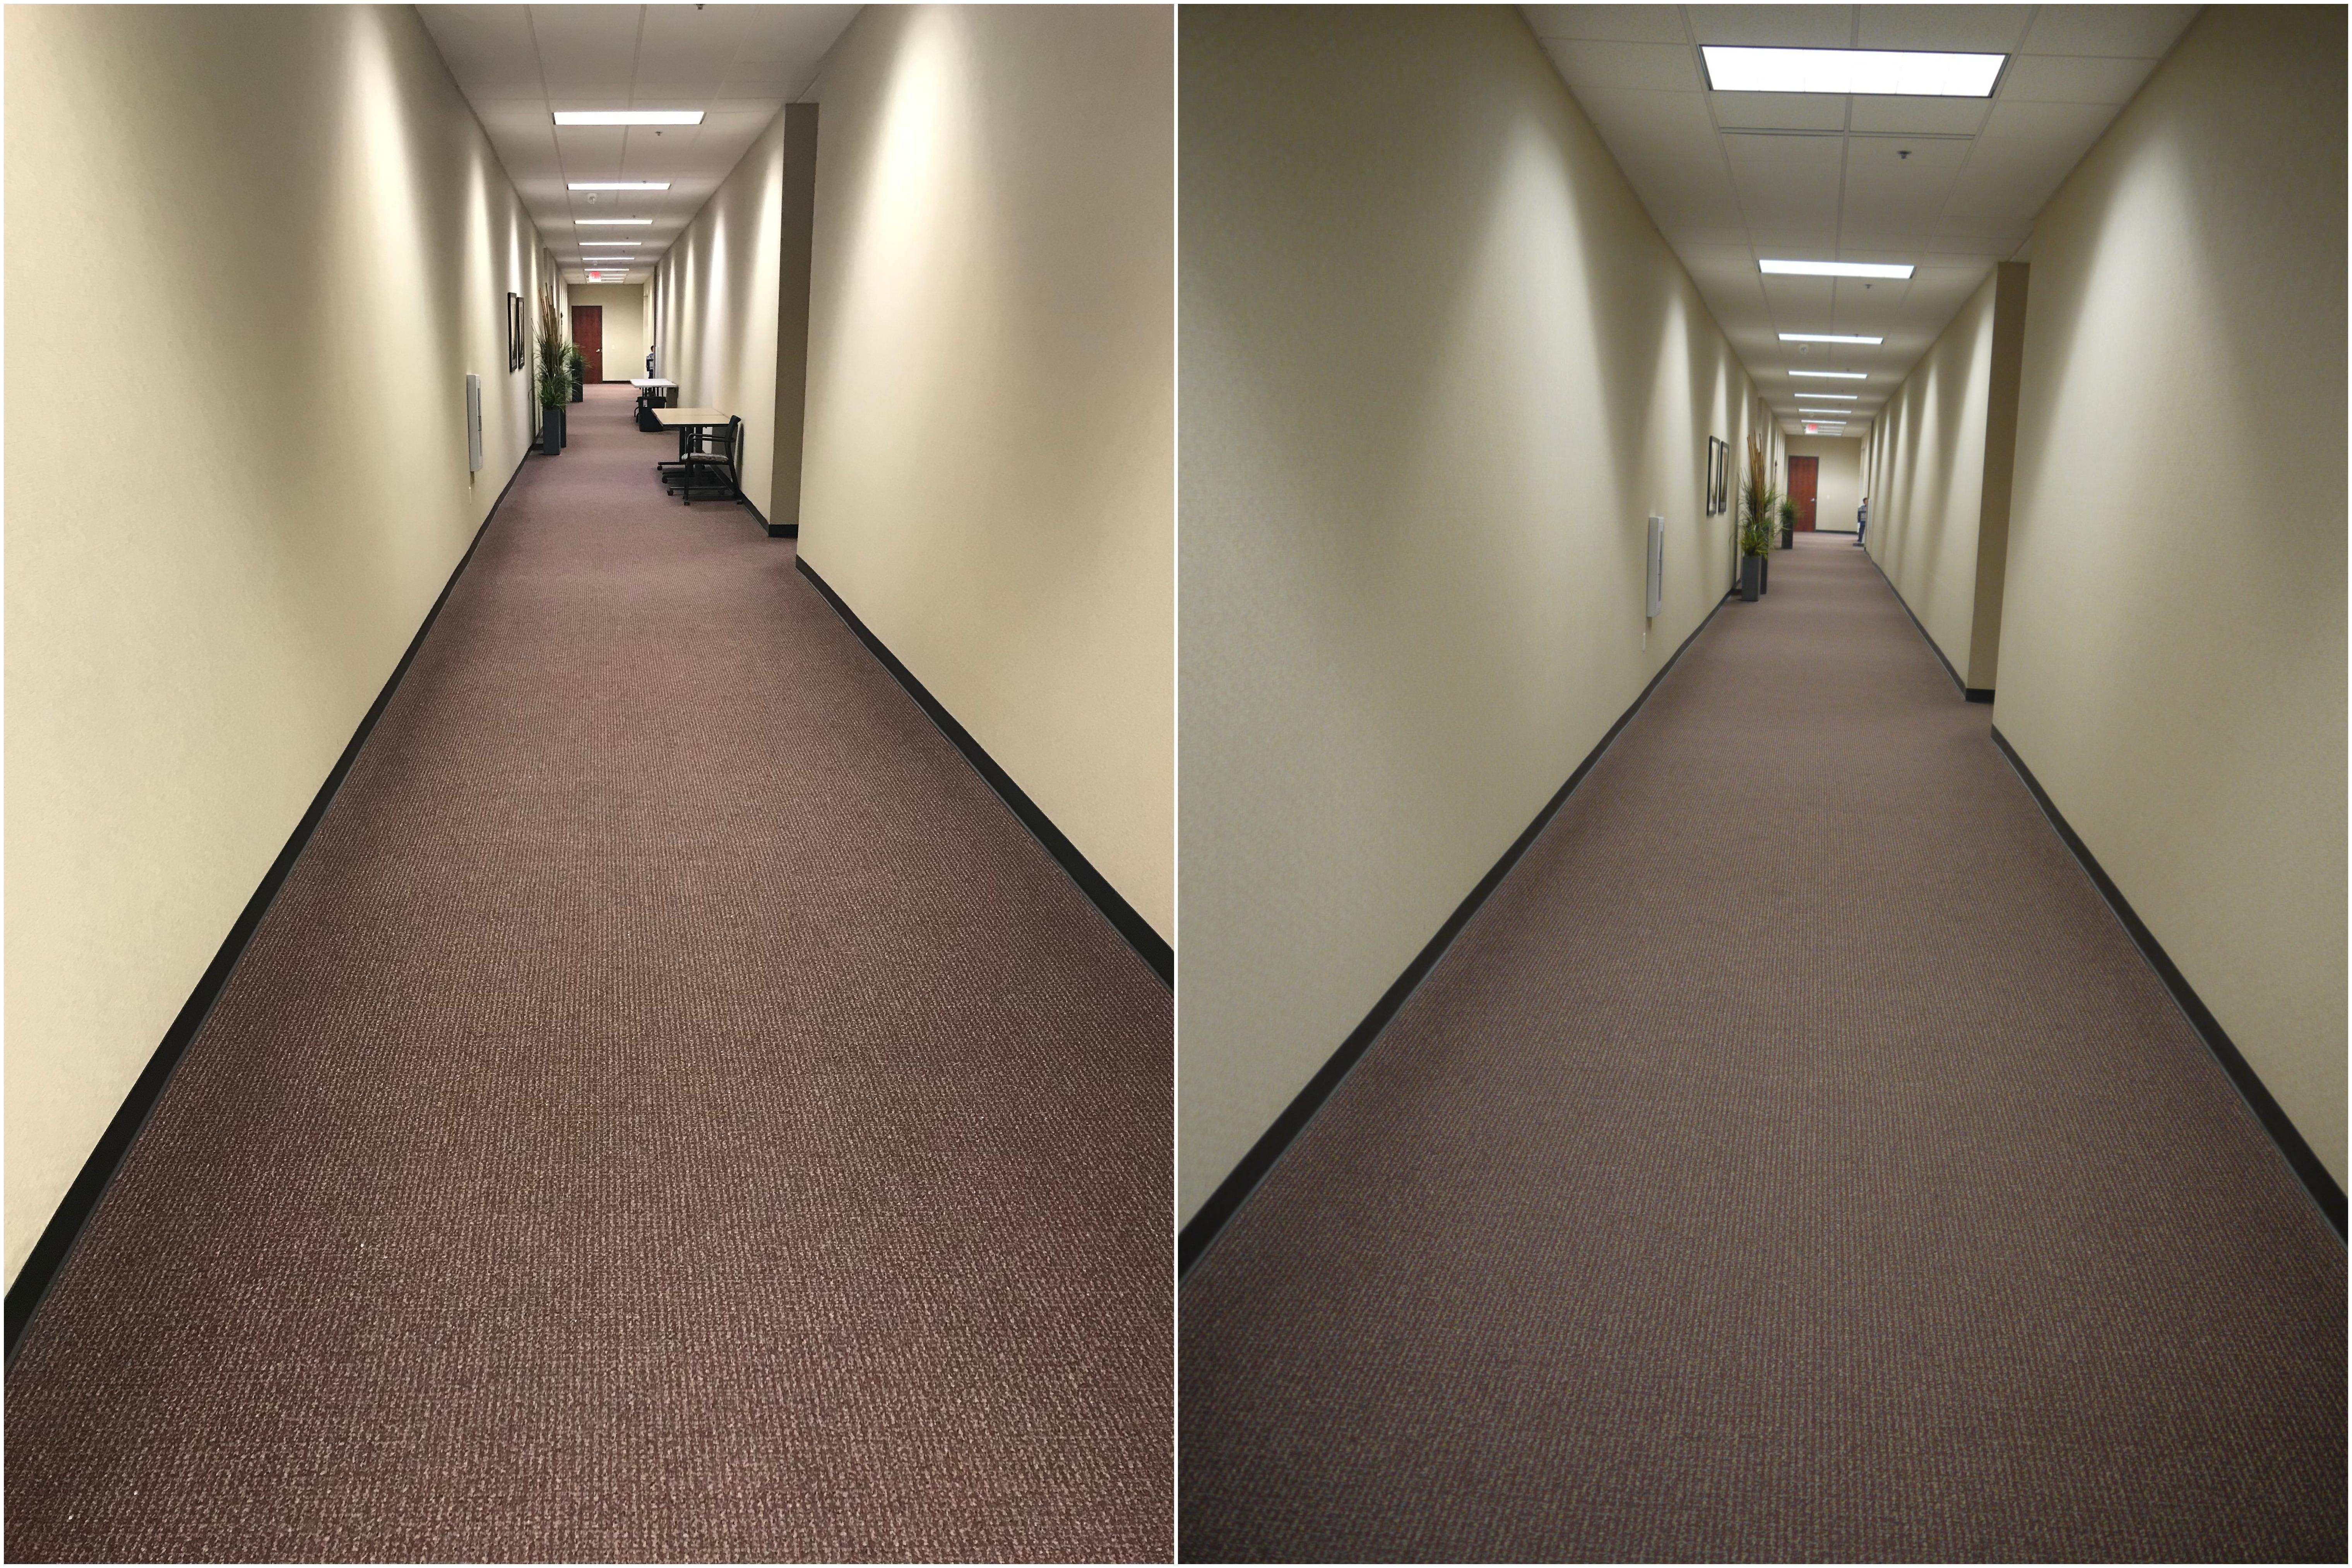 24-7 Hallway